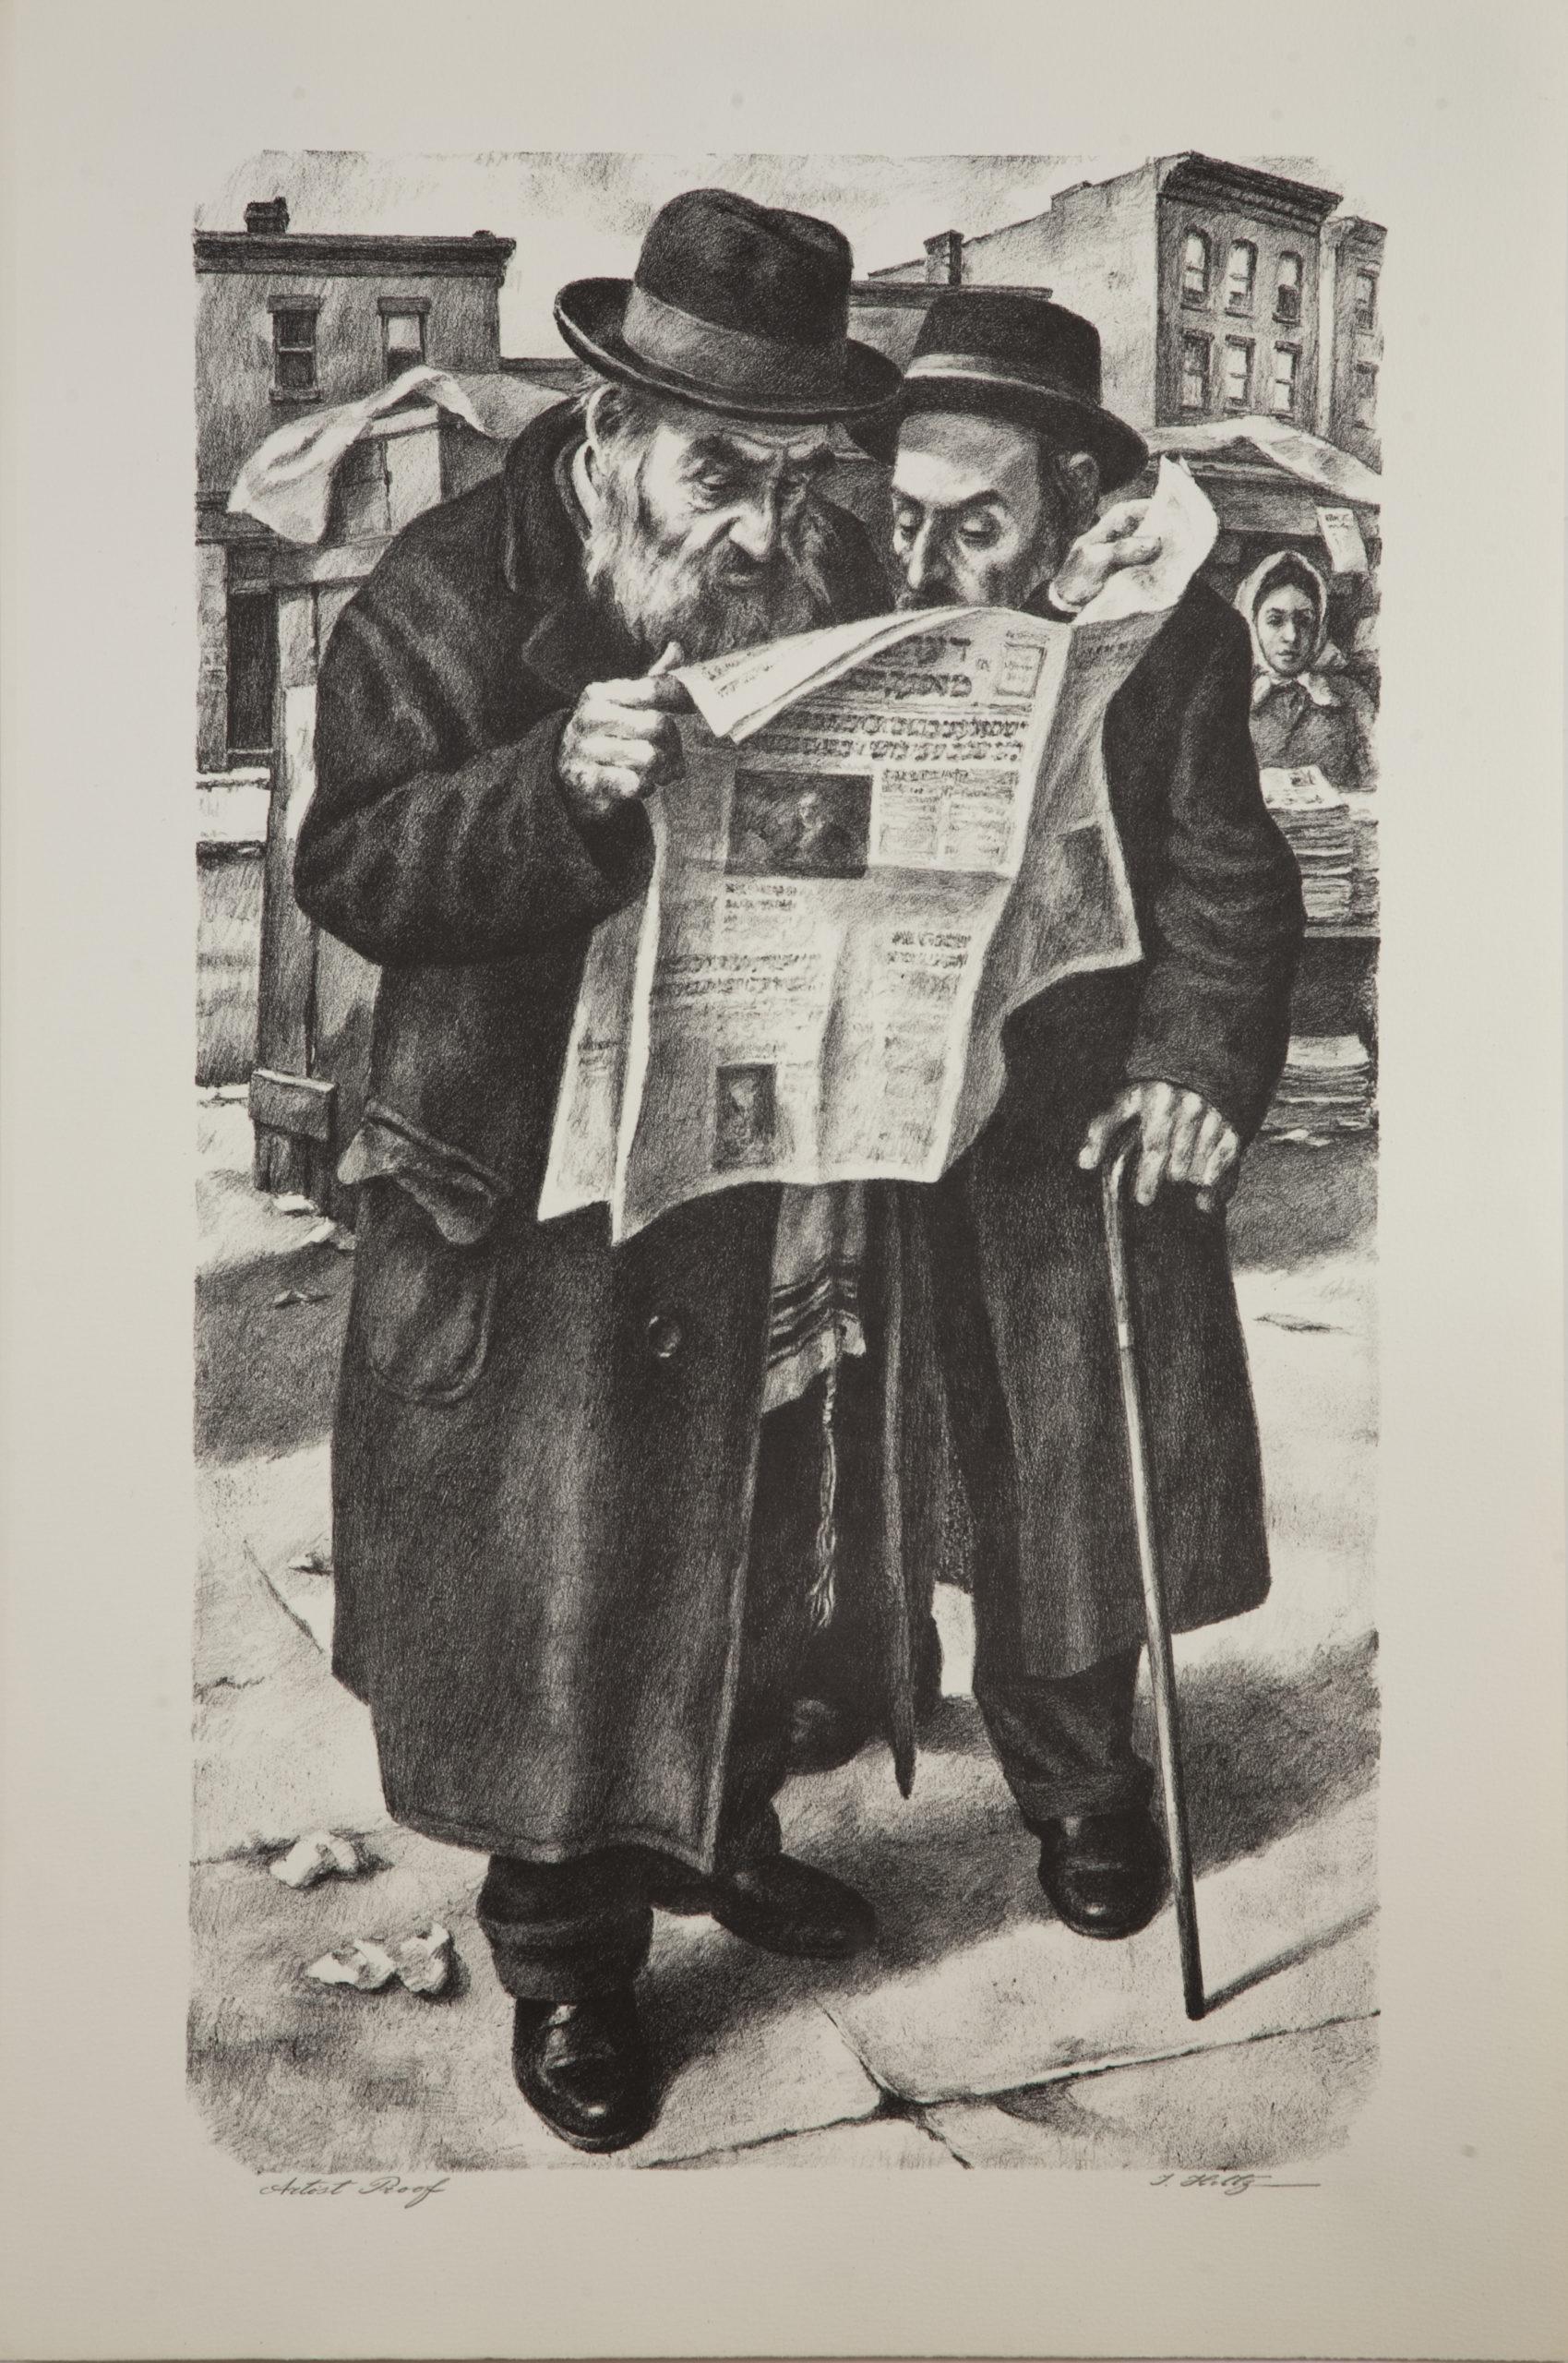 L19B Reading the Newspaper - Black & White - Lithograph - 20 x 30 - No Frame- $500